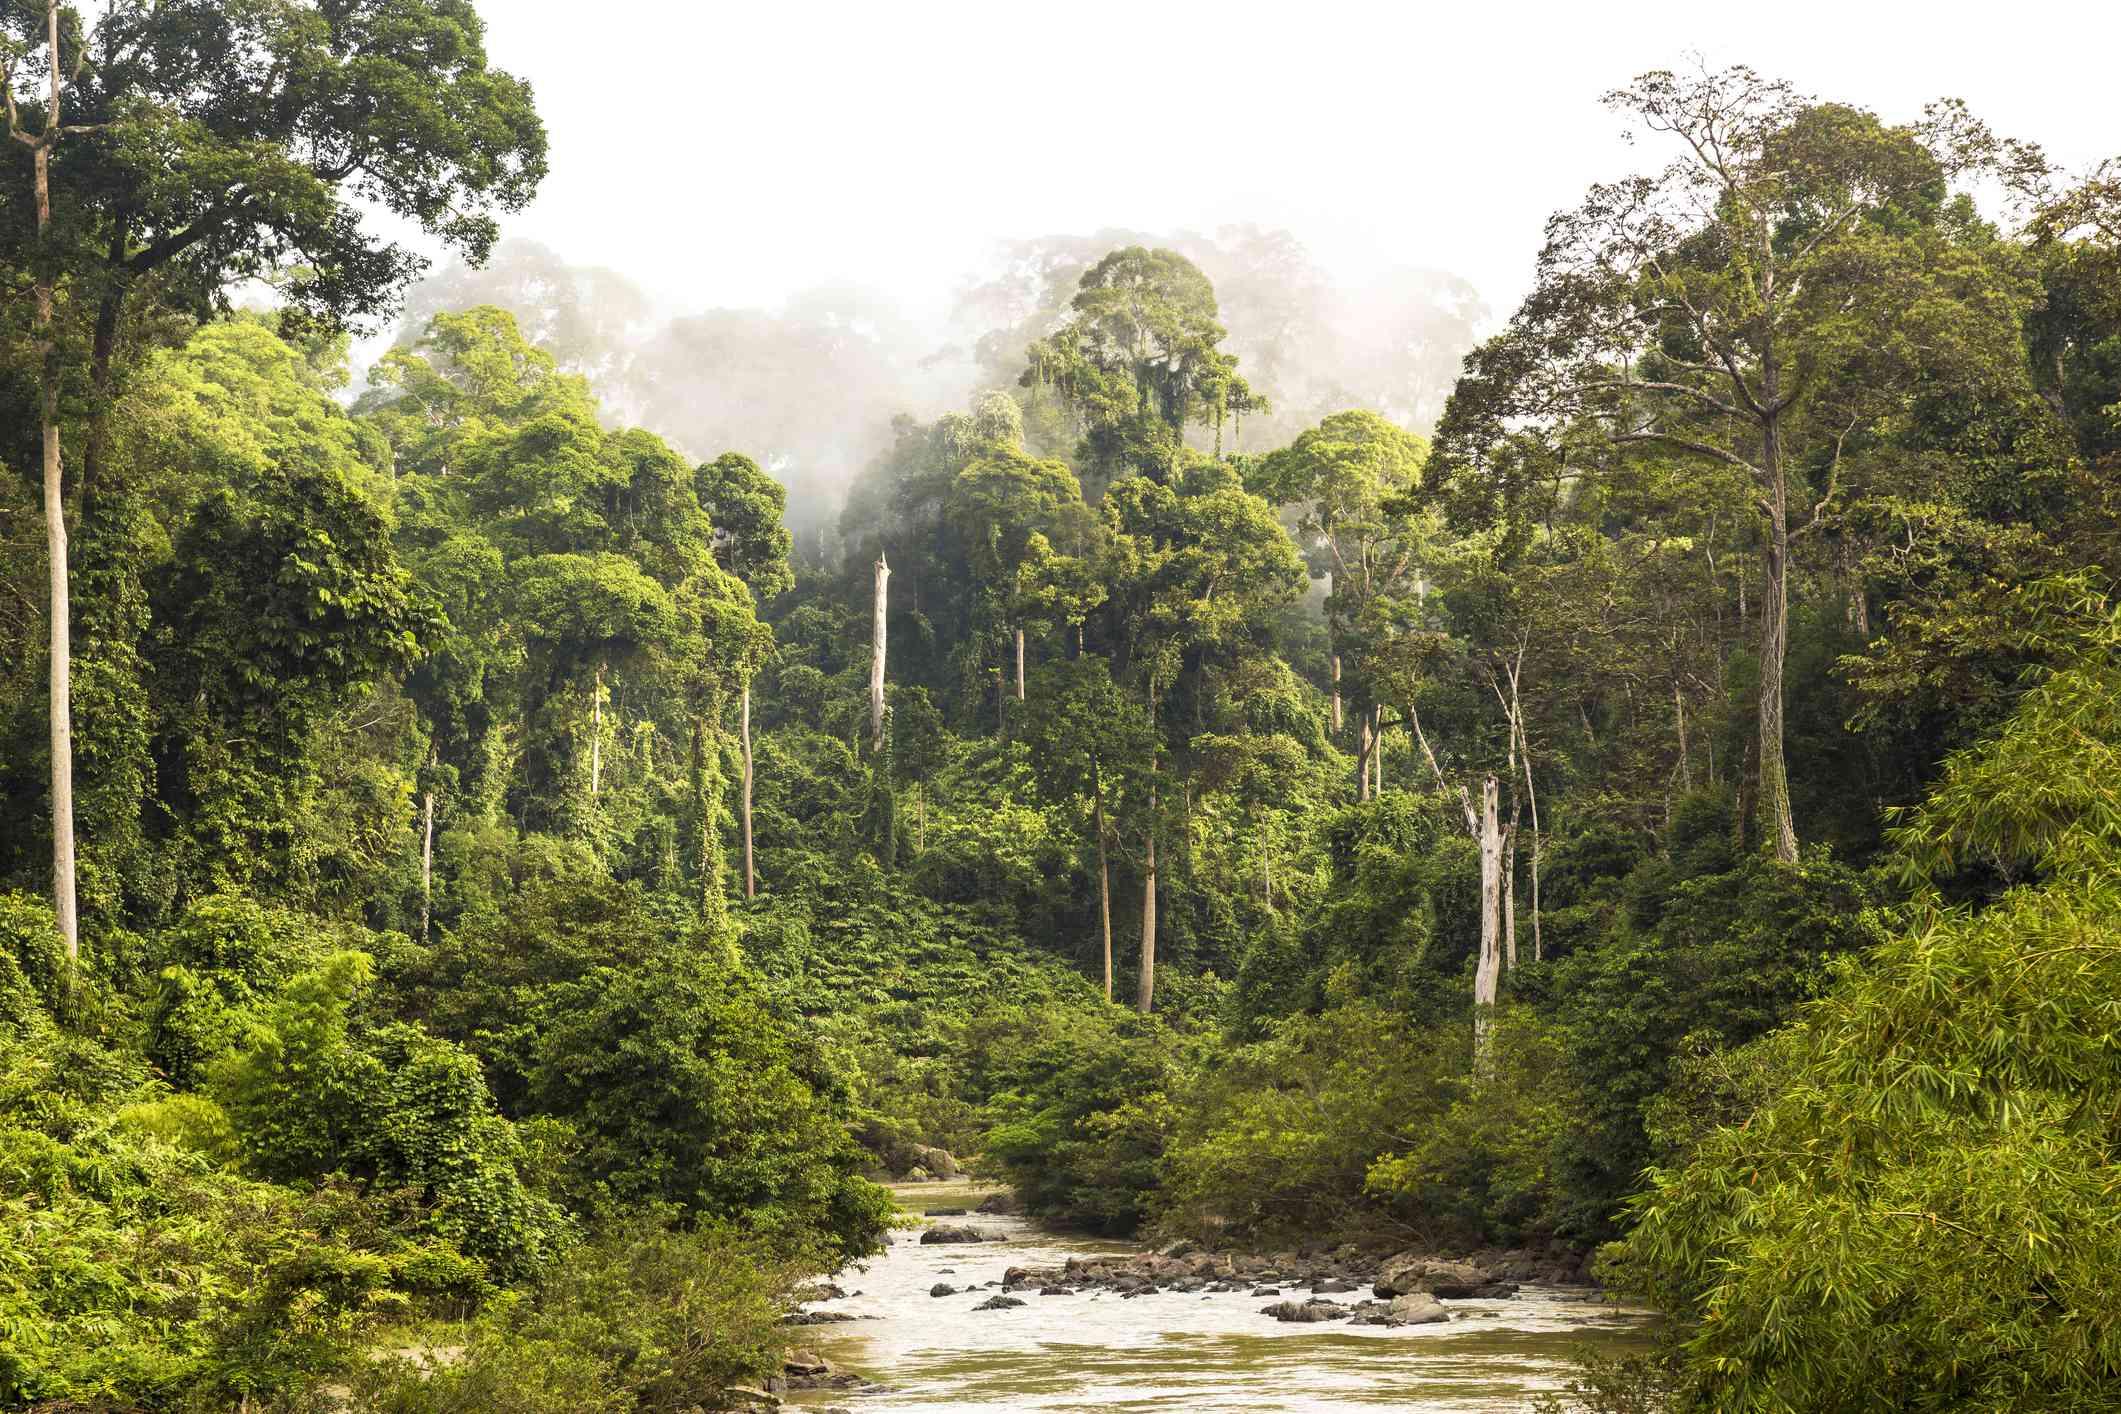 A rainforest in Sabah, Borneo, Malaysia